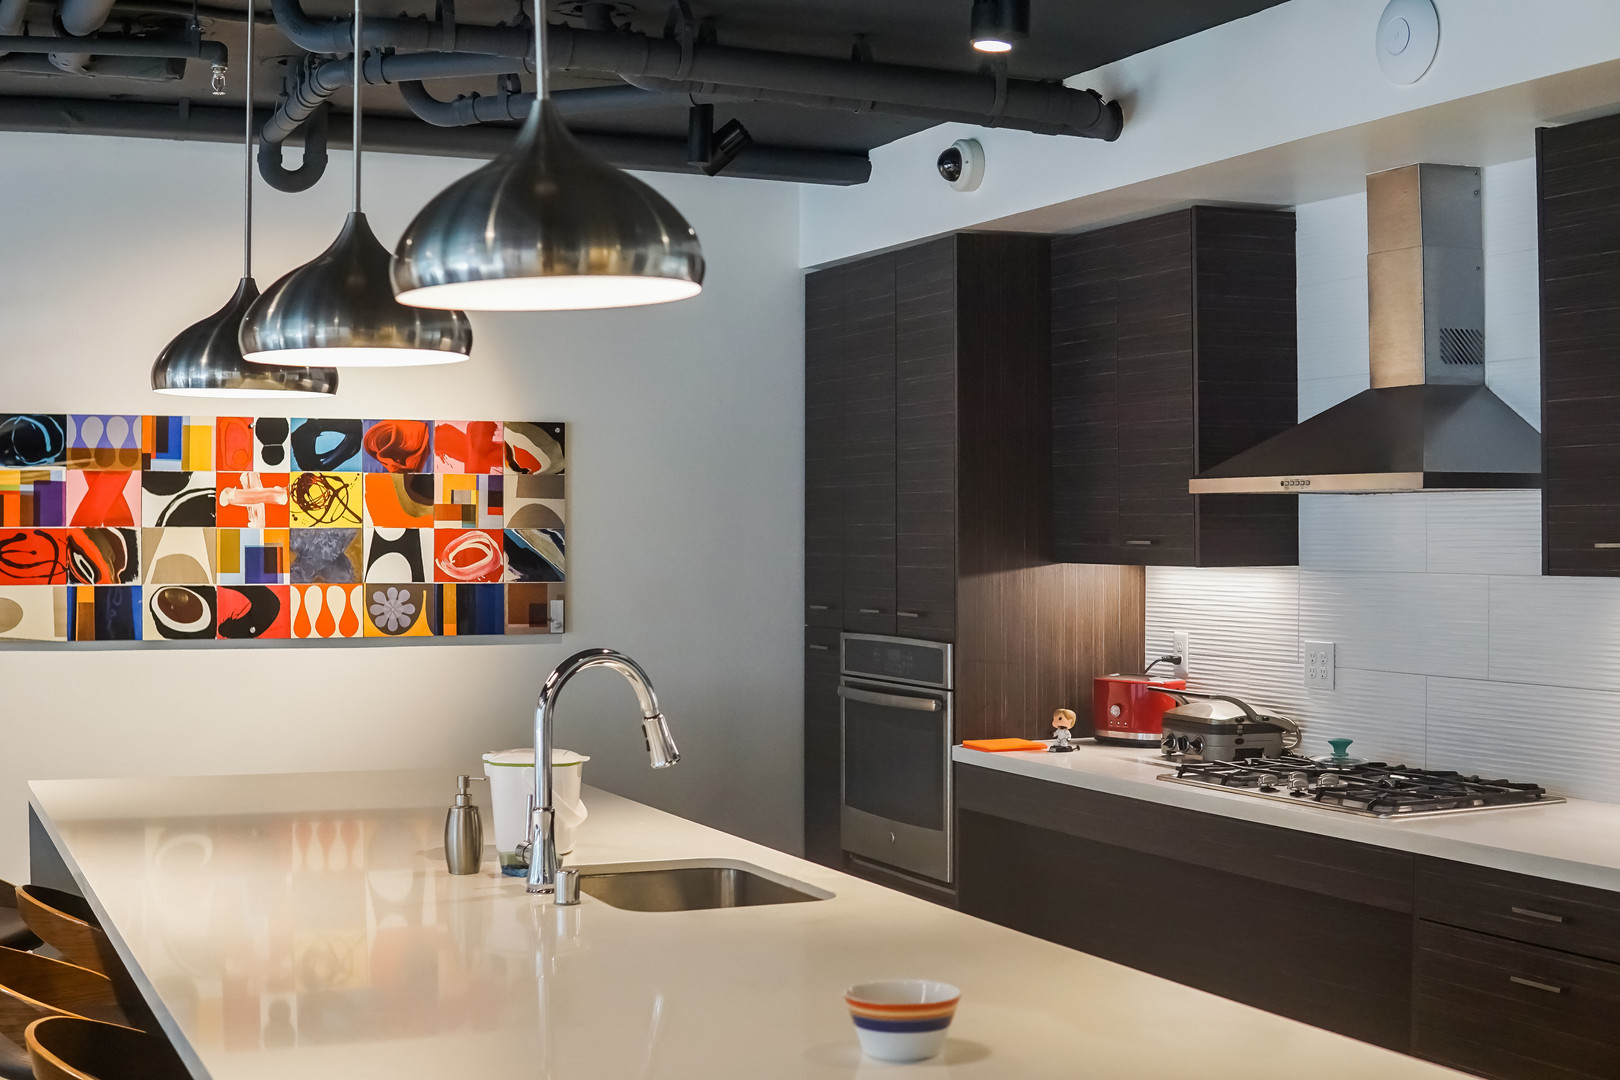 Club Room Kitchen